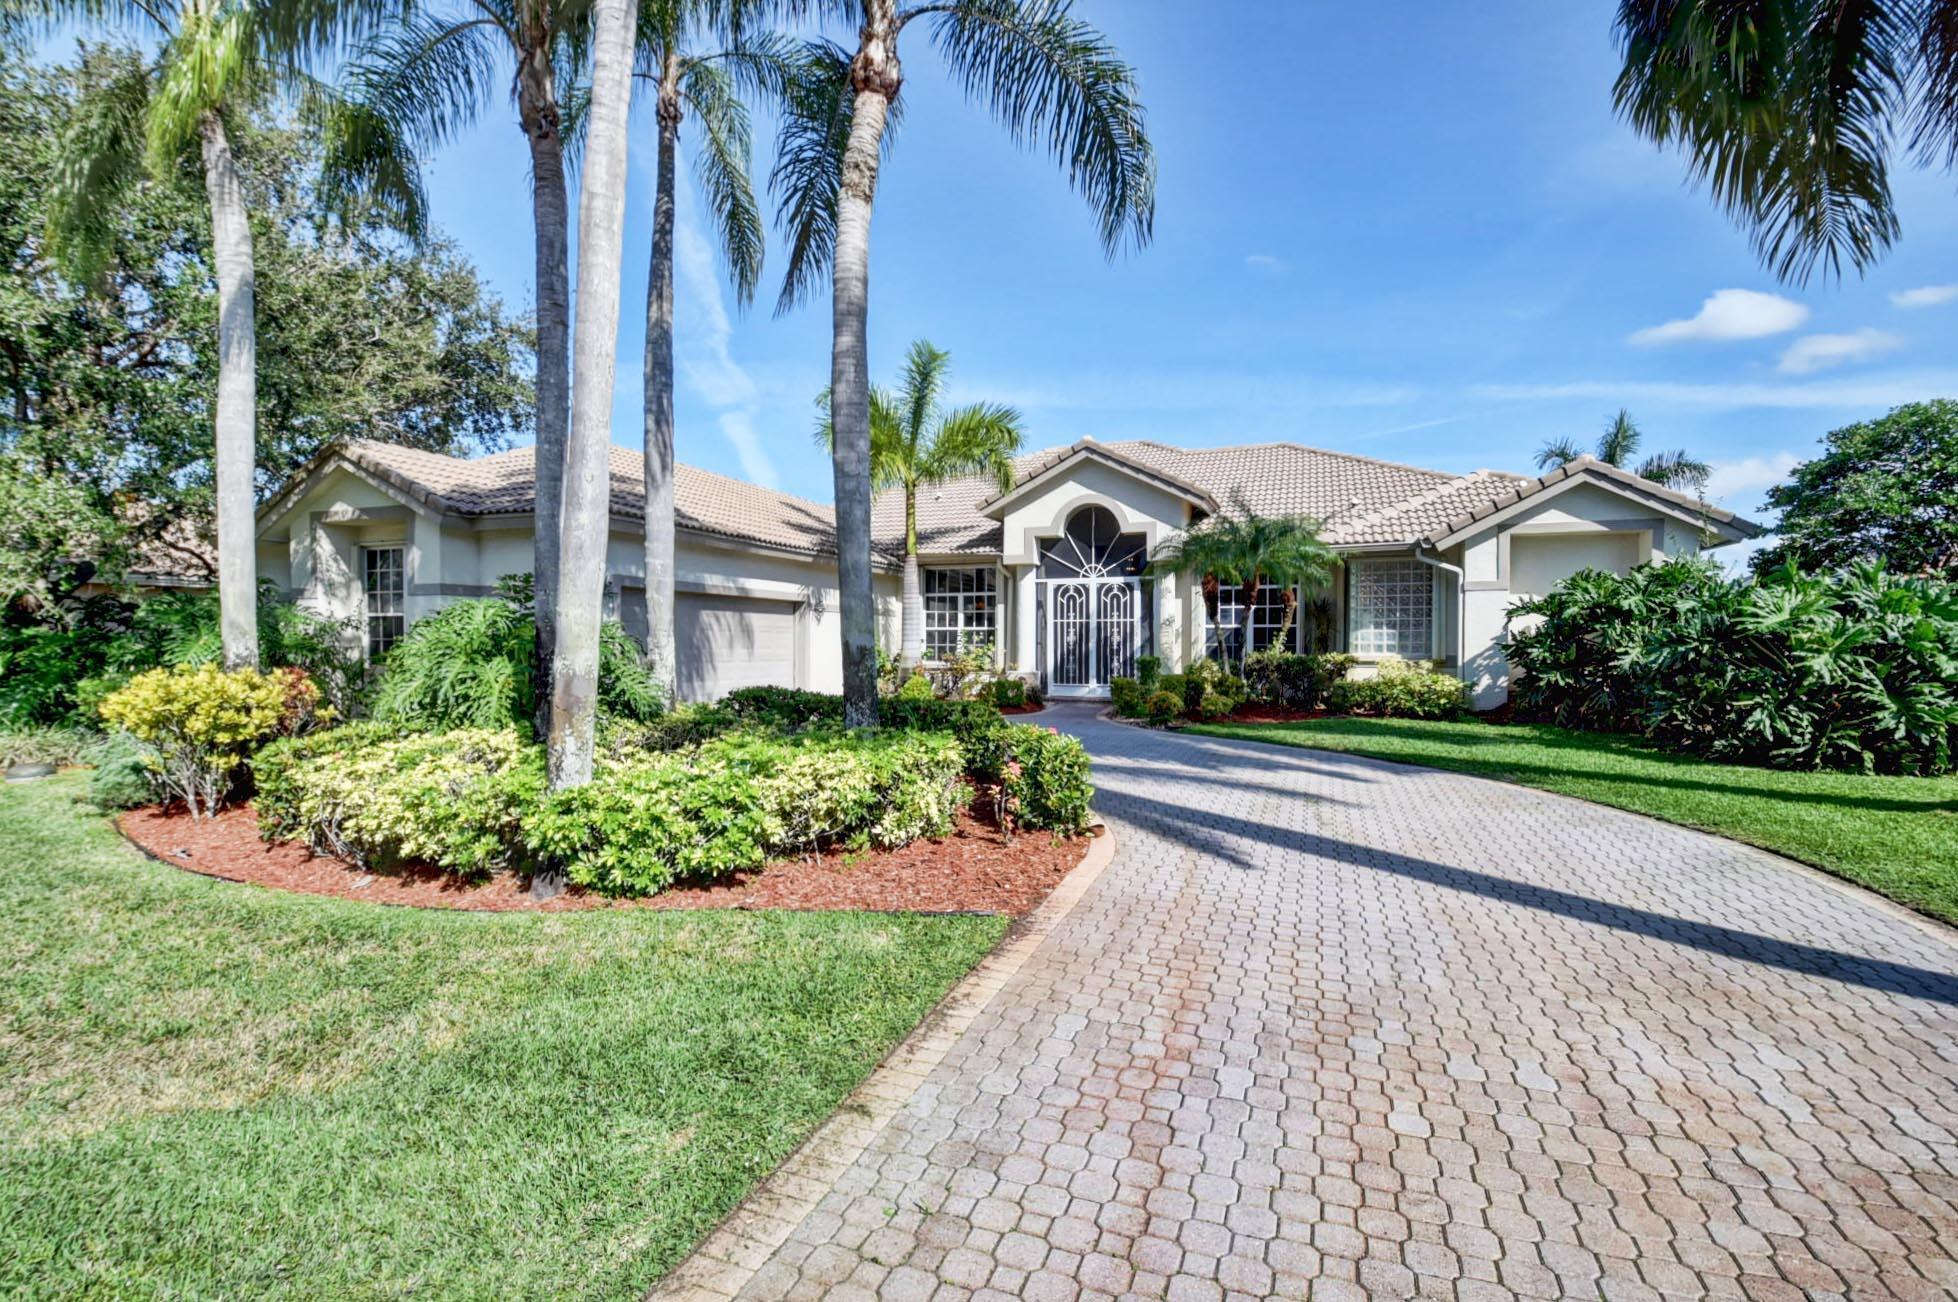 8208 Desmond Drive Boynton Beach, FL 33472